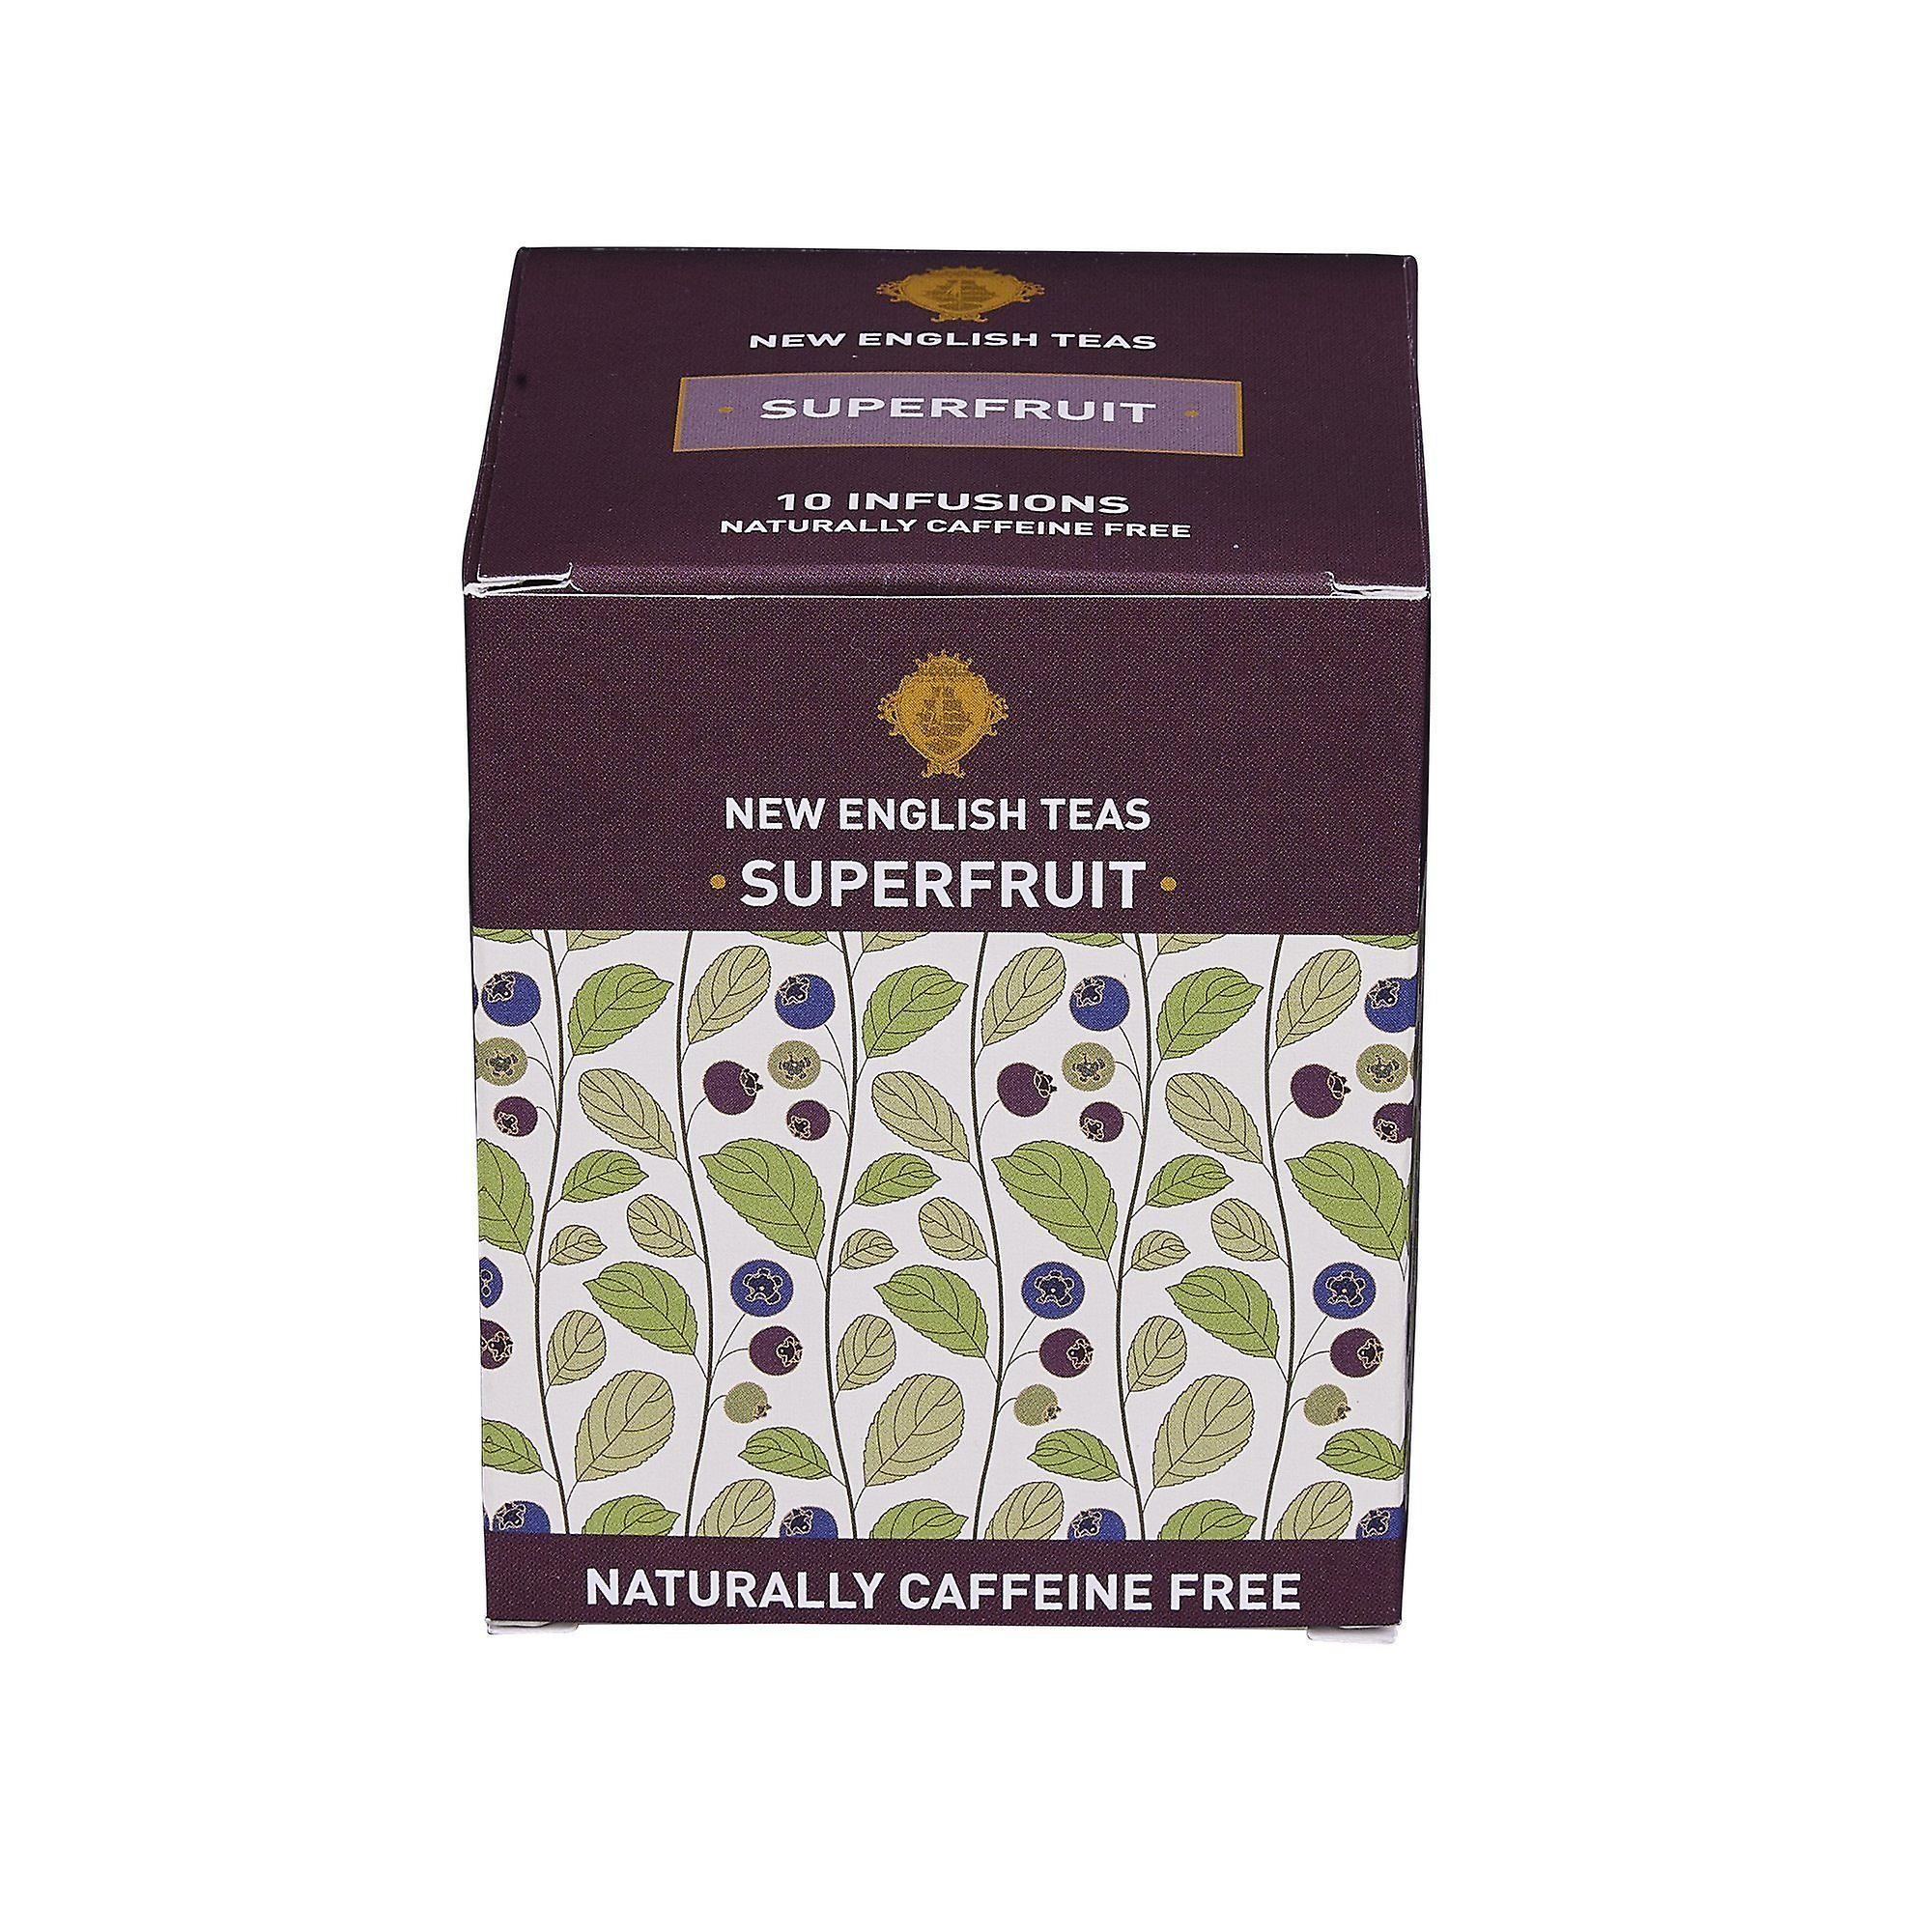 Superfruits tea 10 individually wrapped teabags